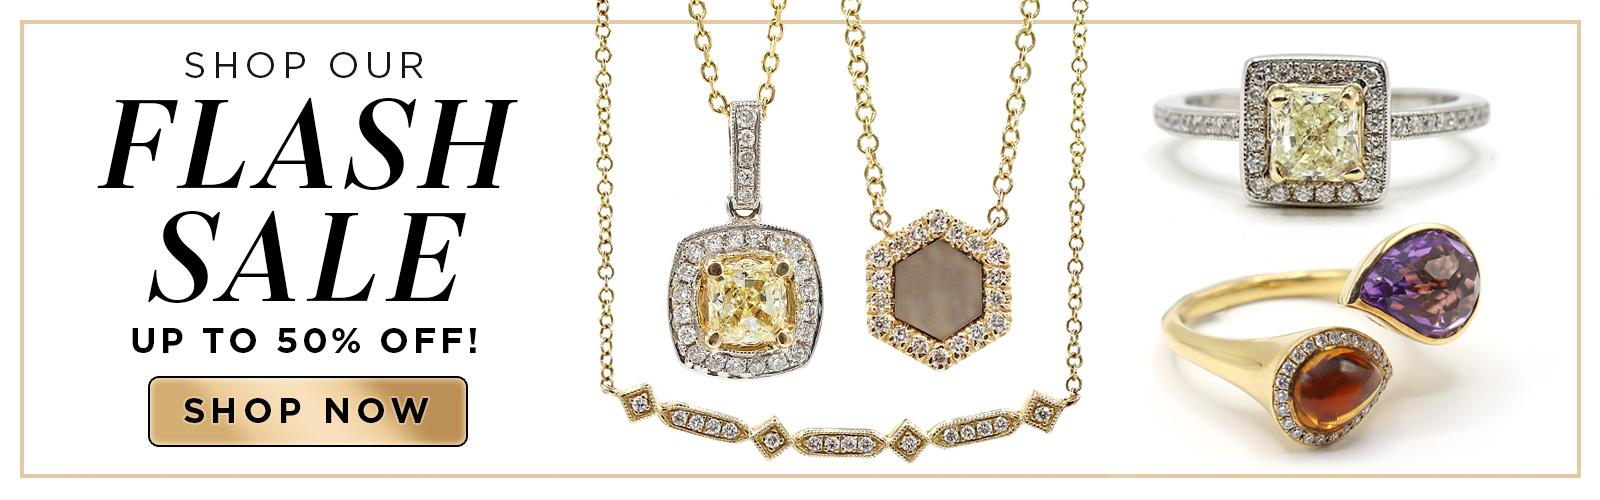 Bentley Diamond - Flash Sales!